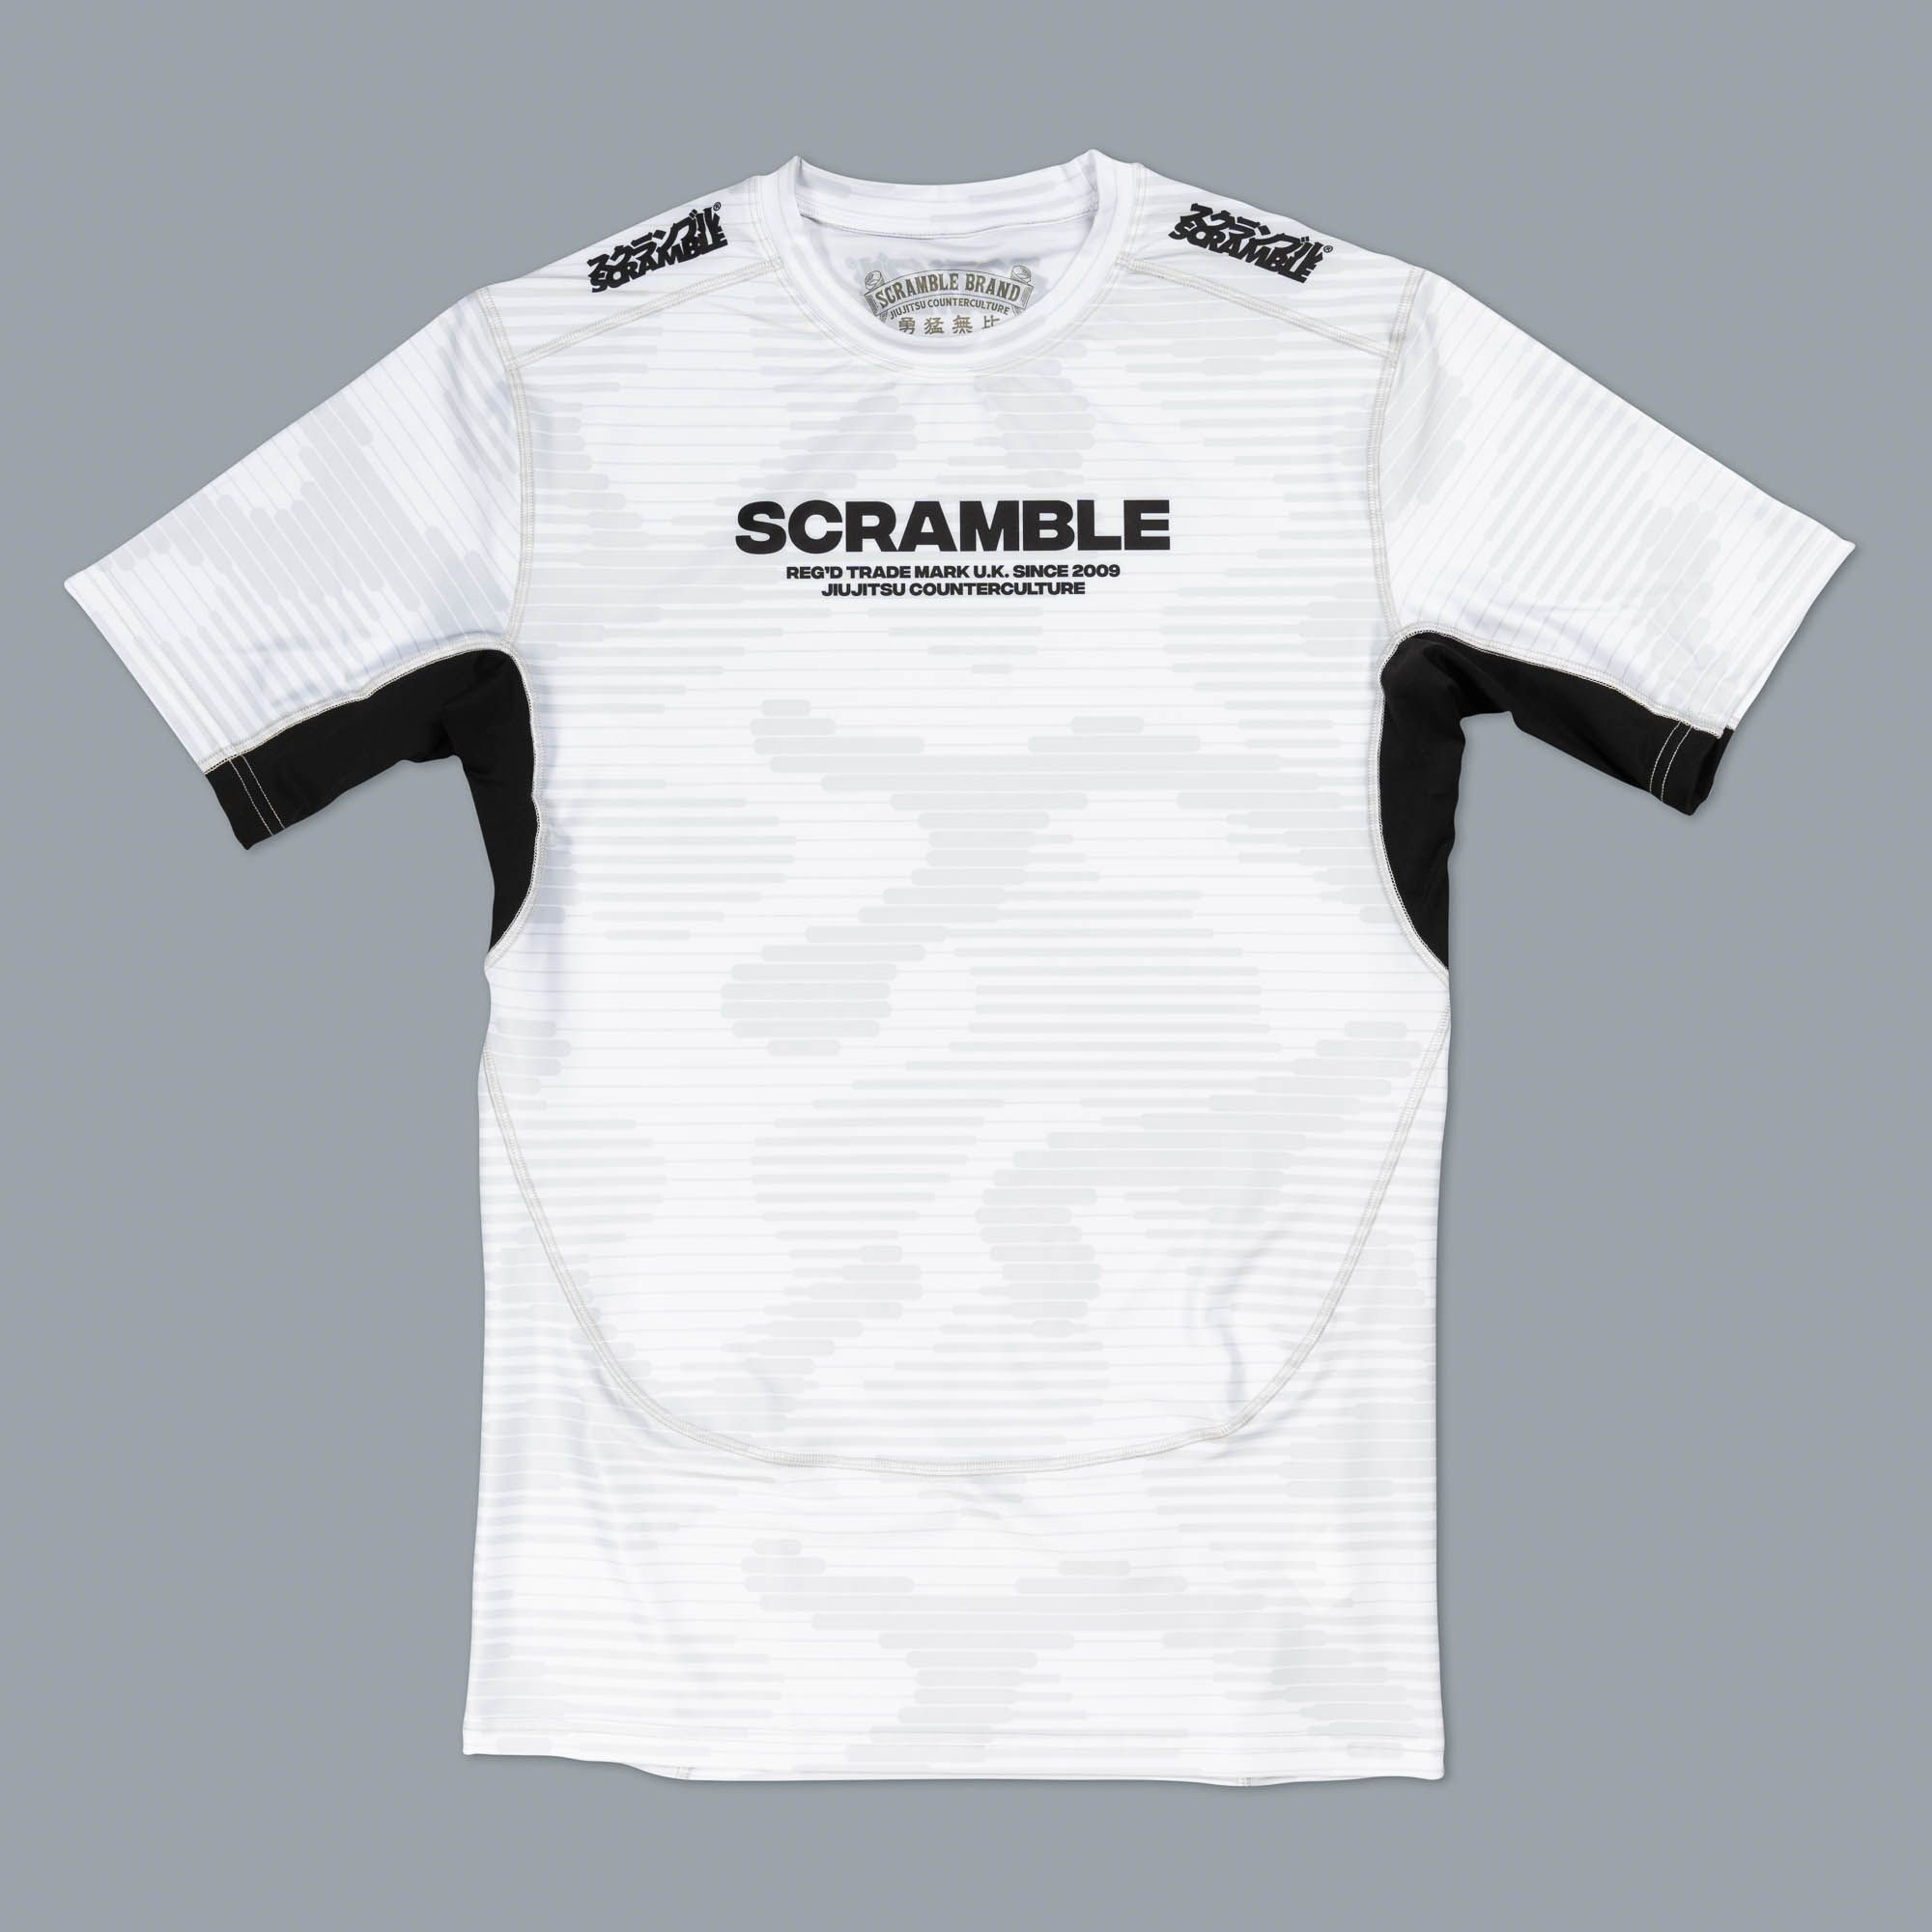 SCRAMBLE TACTIC ラッシュガード ホワイト 半袖